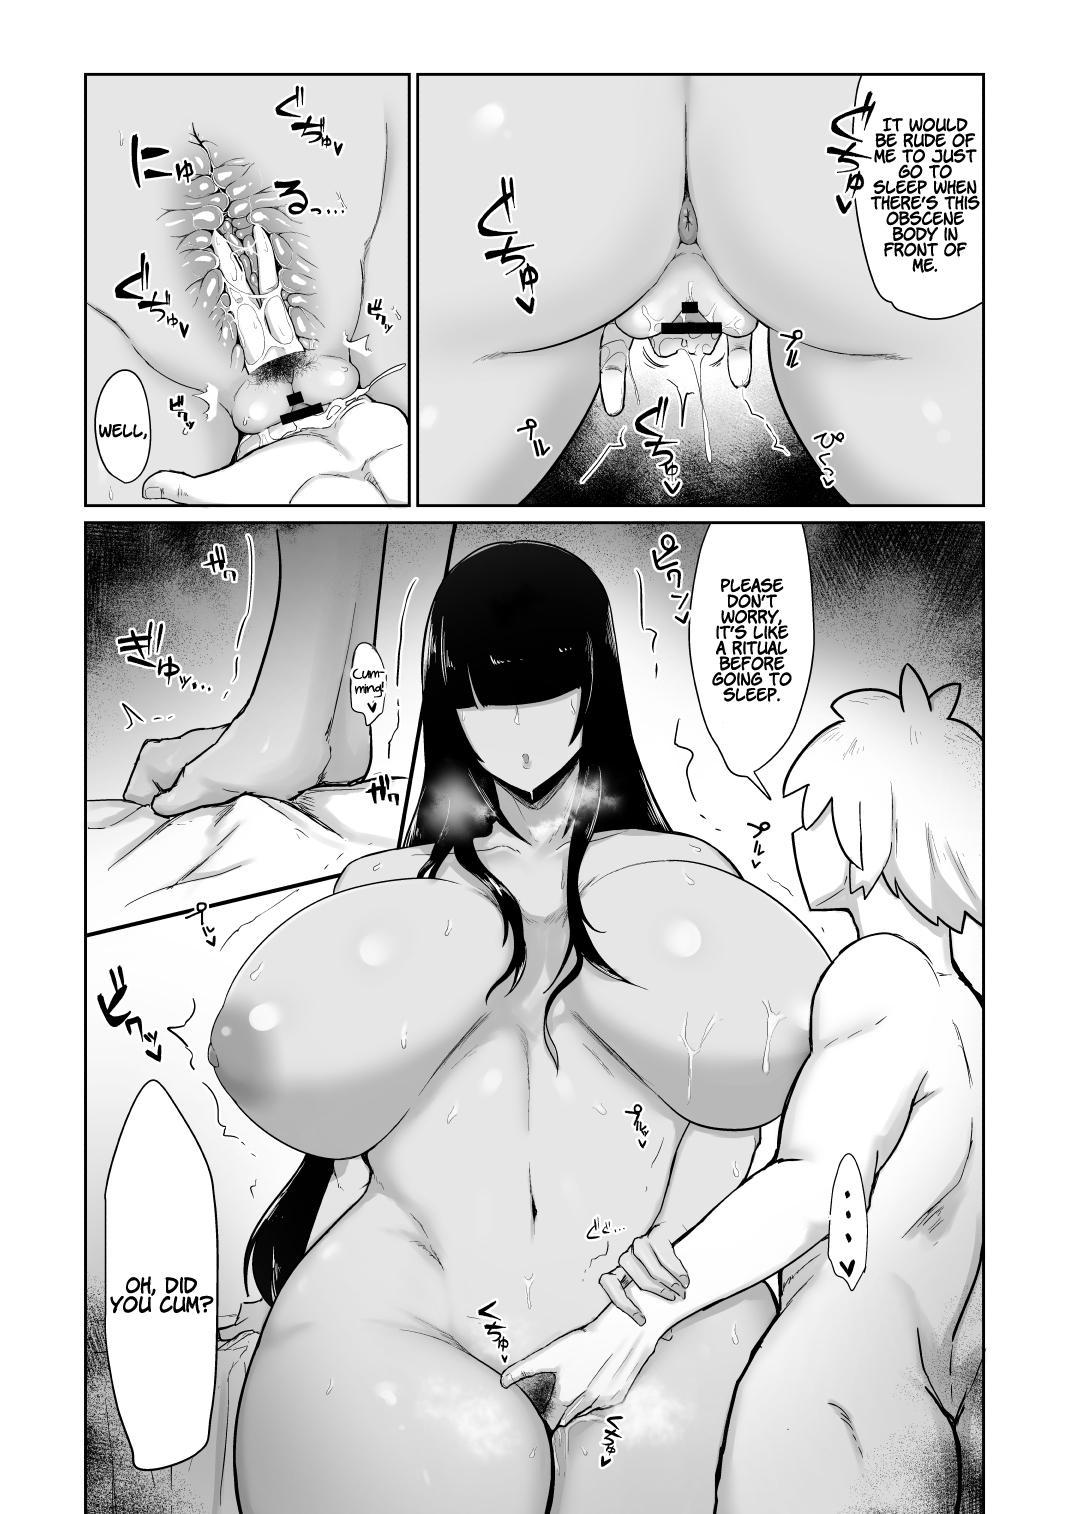 Party ni Yatotta Mahoutsukai ni Musekinin Tanetsuke Suru Hanashi | The Story of Mating Irresponsibly with a Witch Hired for the Party 15